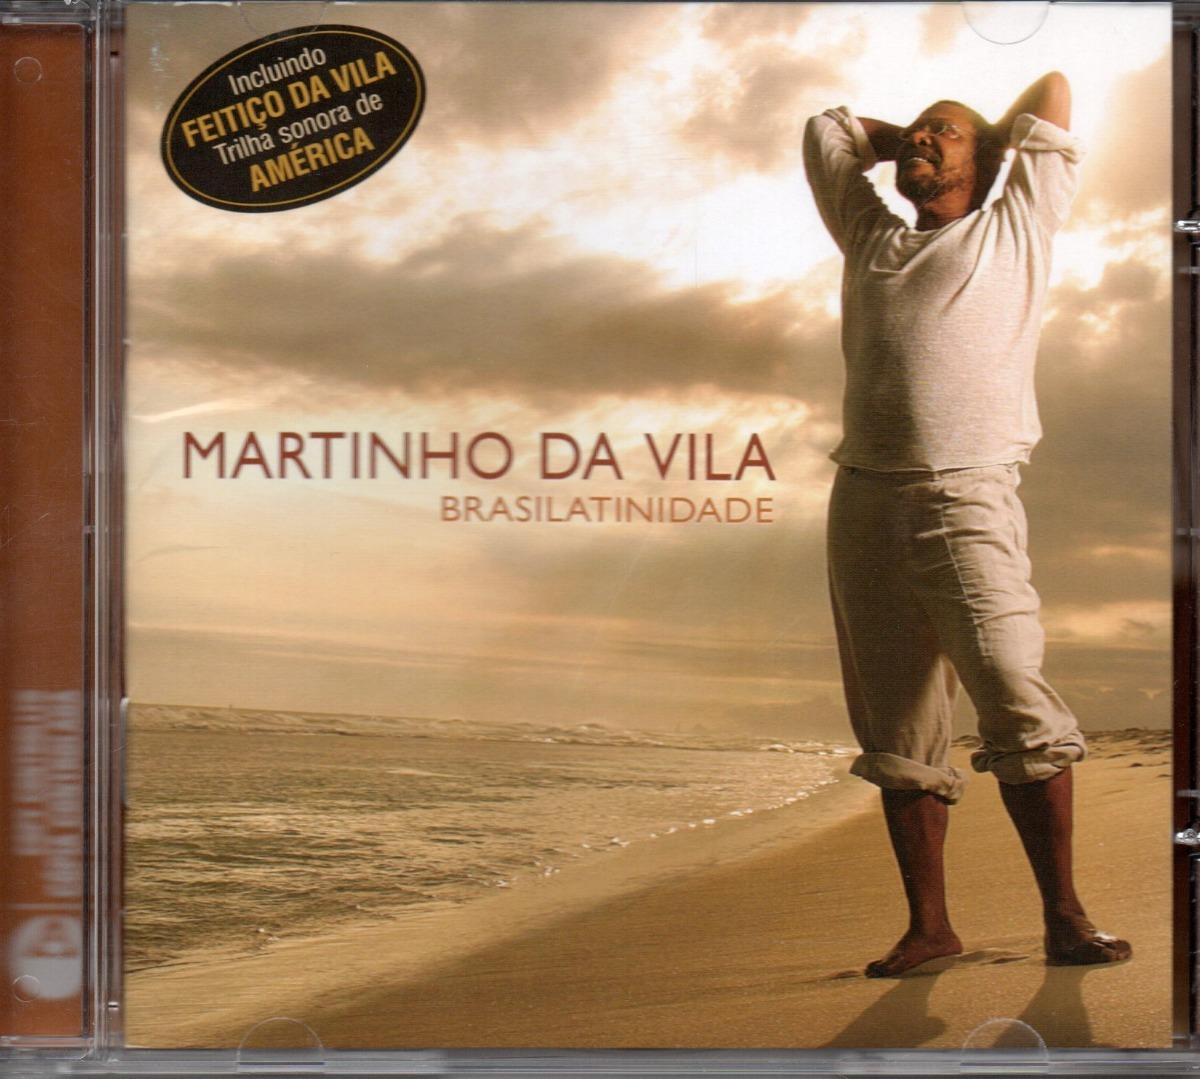 cd martinho da vila brasilatinidade